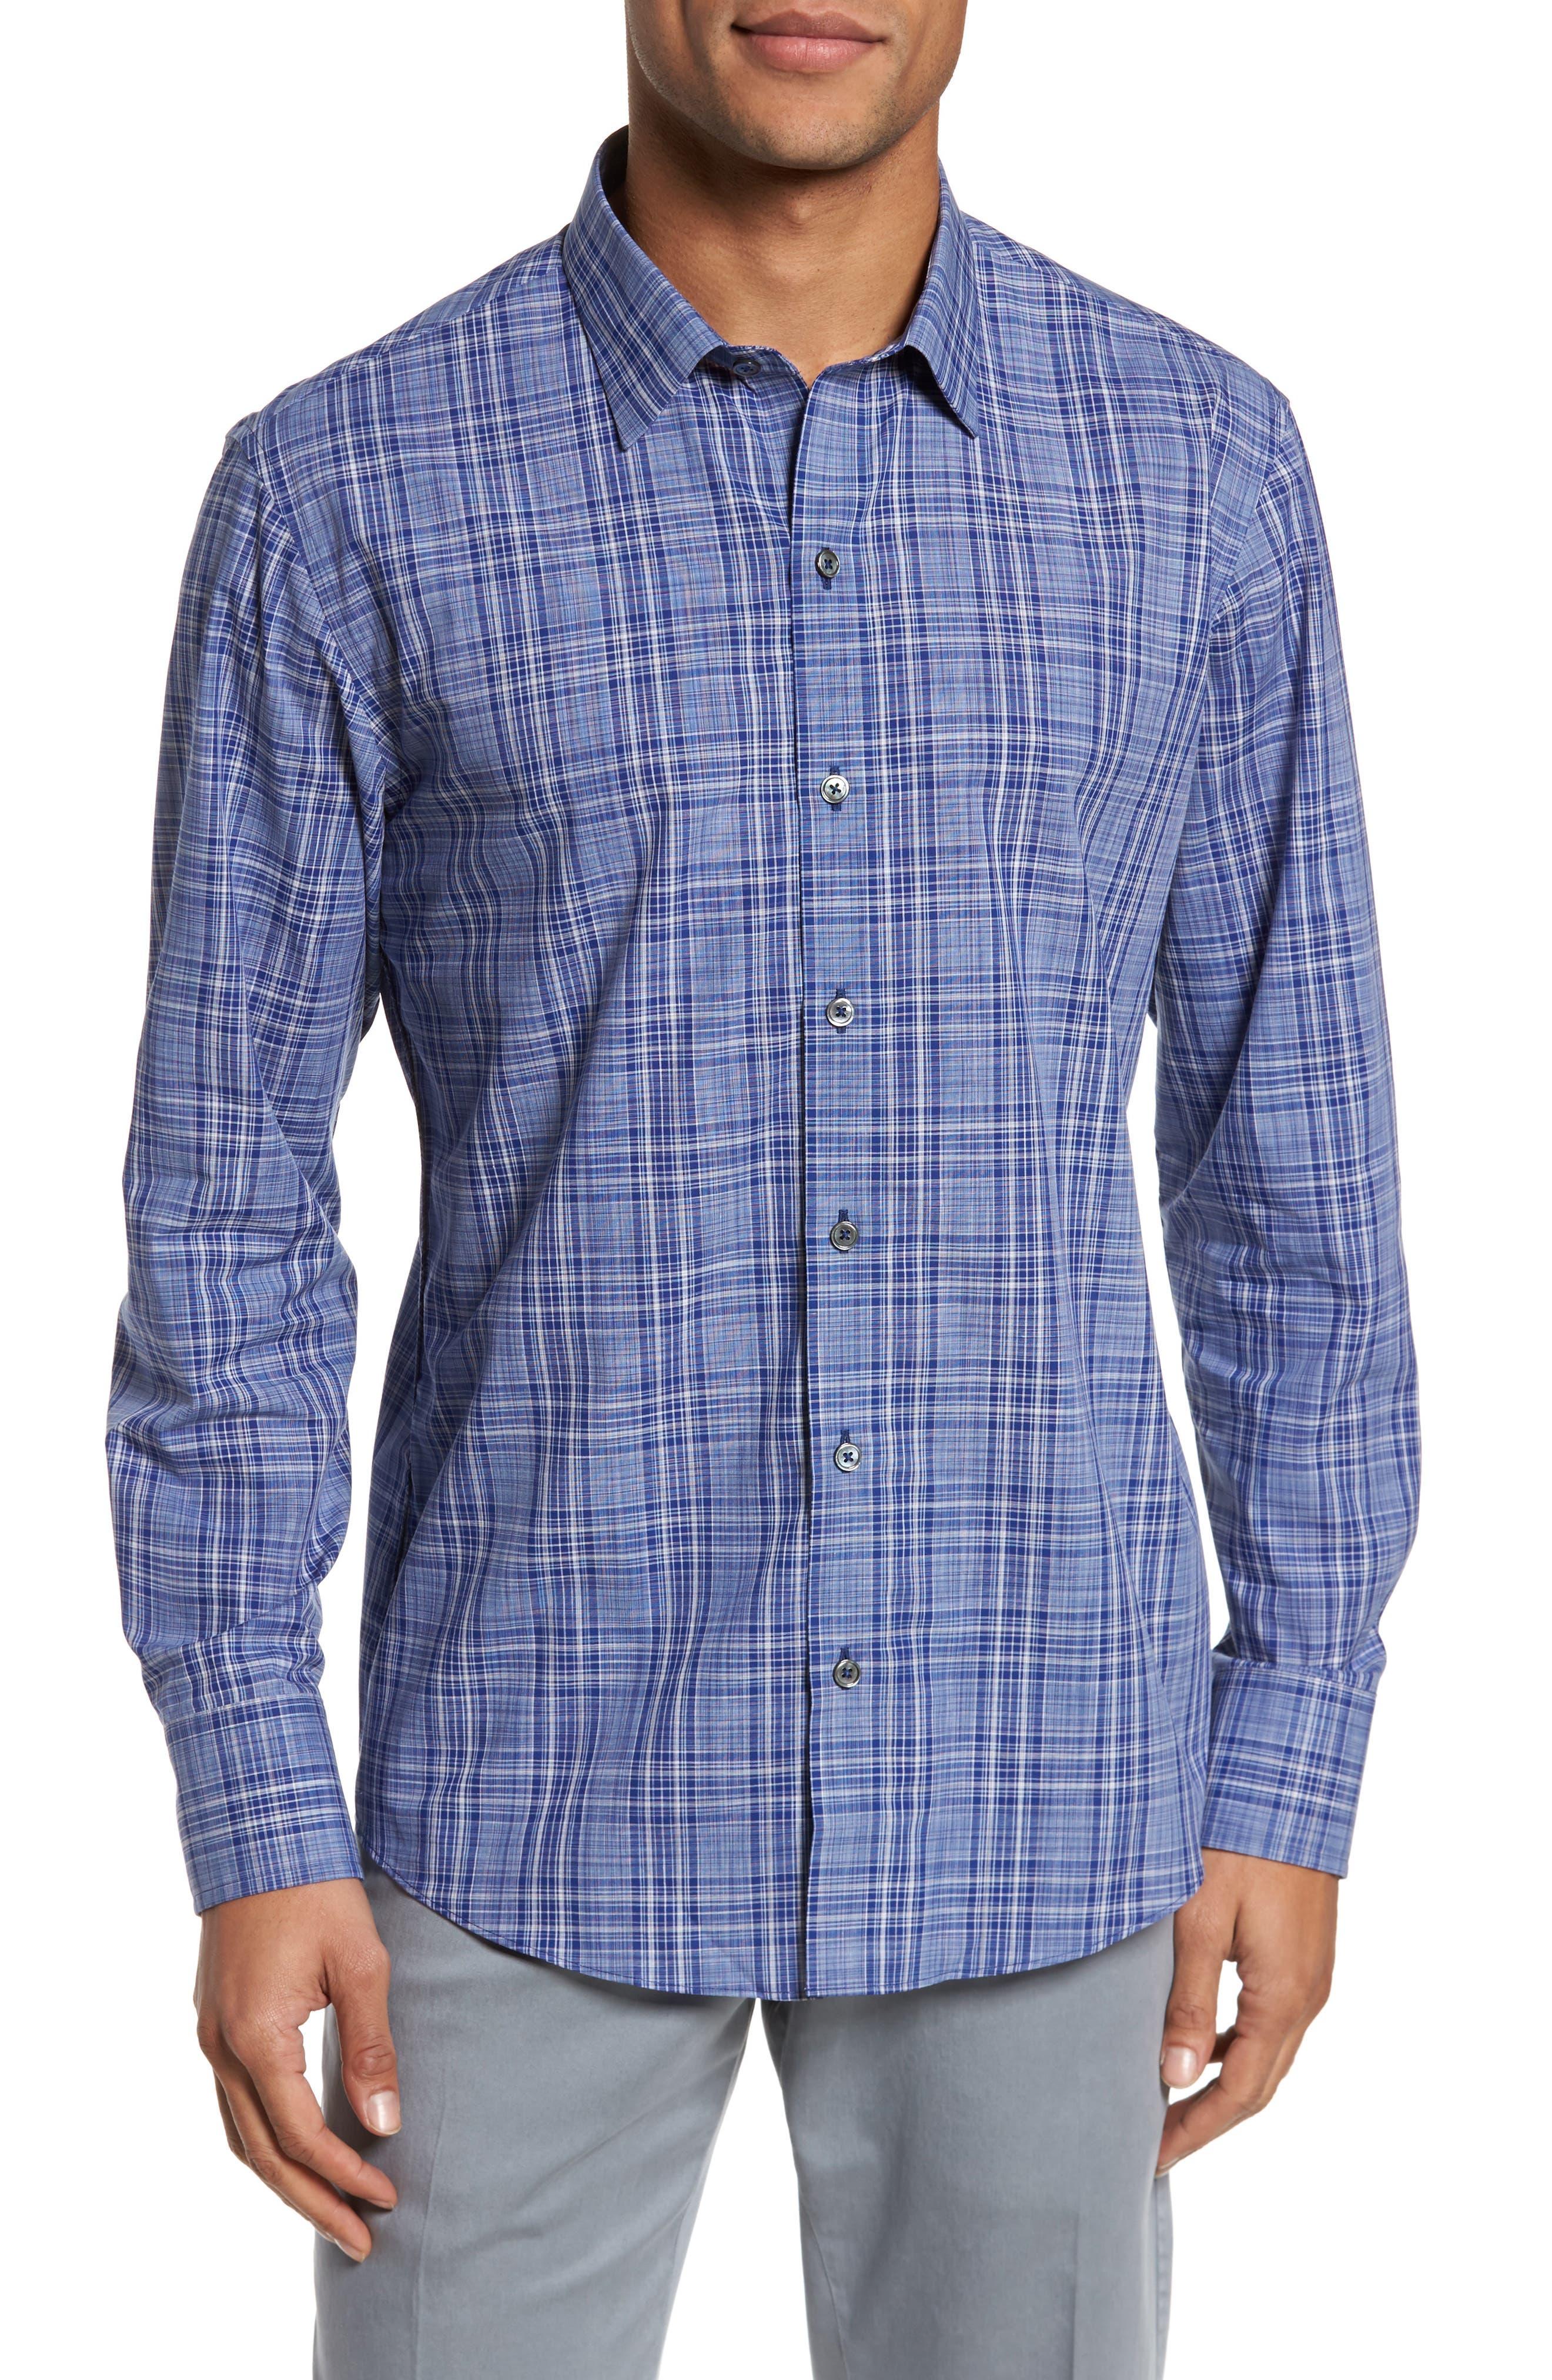 Main Image - Zachary Prell Santos Plaid Sport Shirt